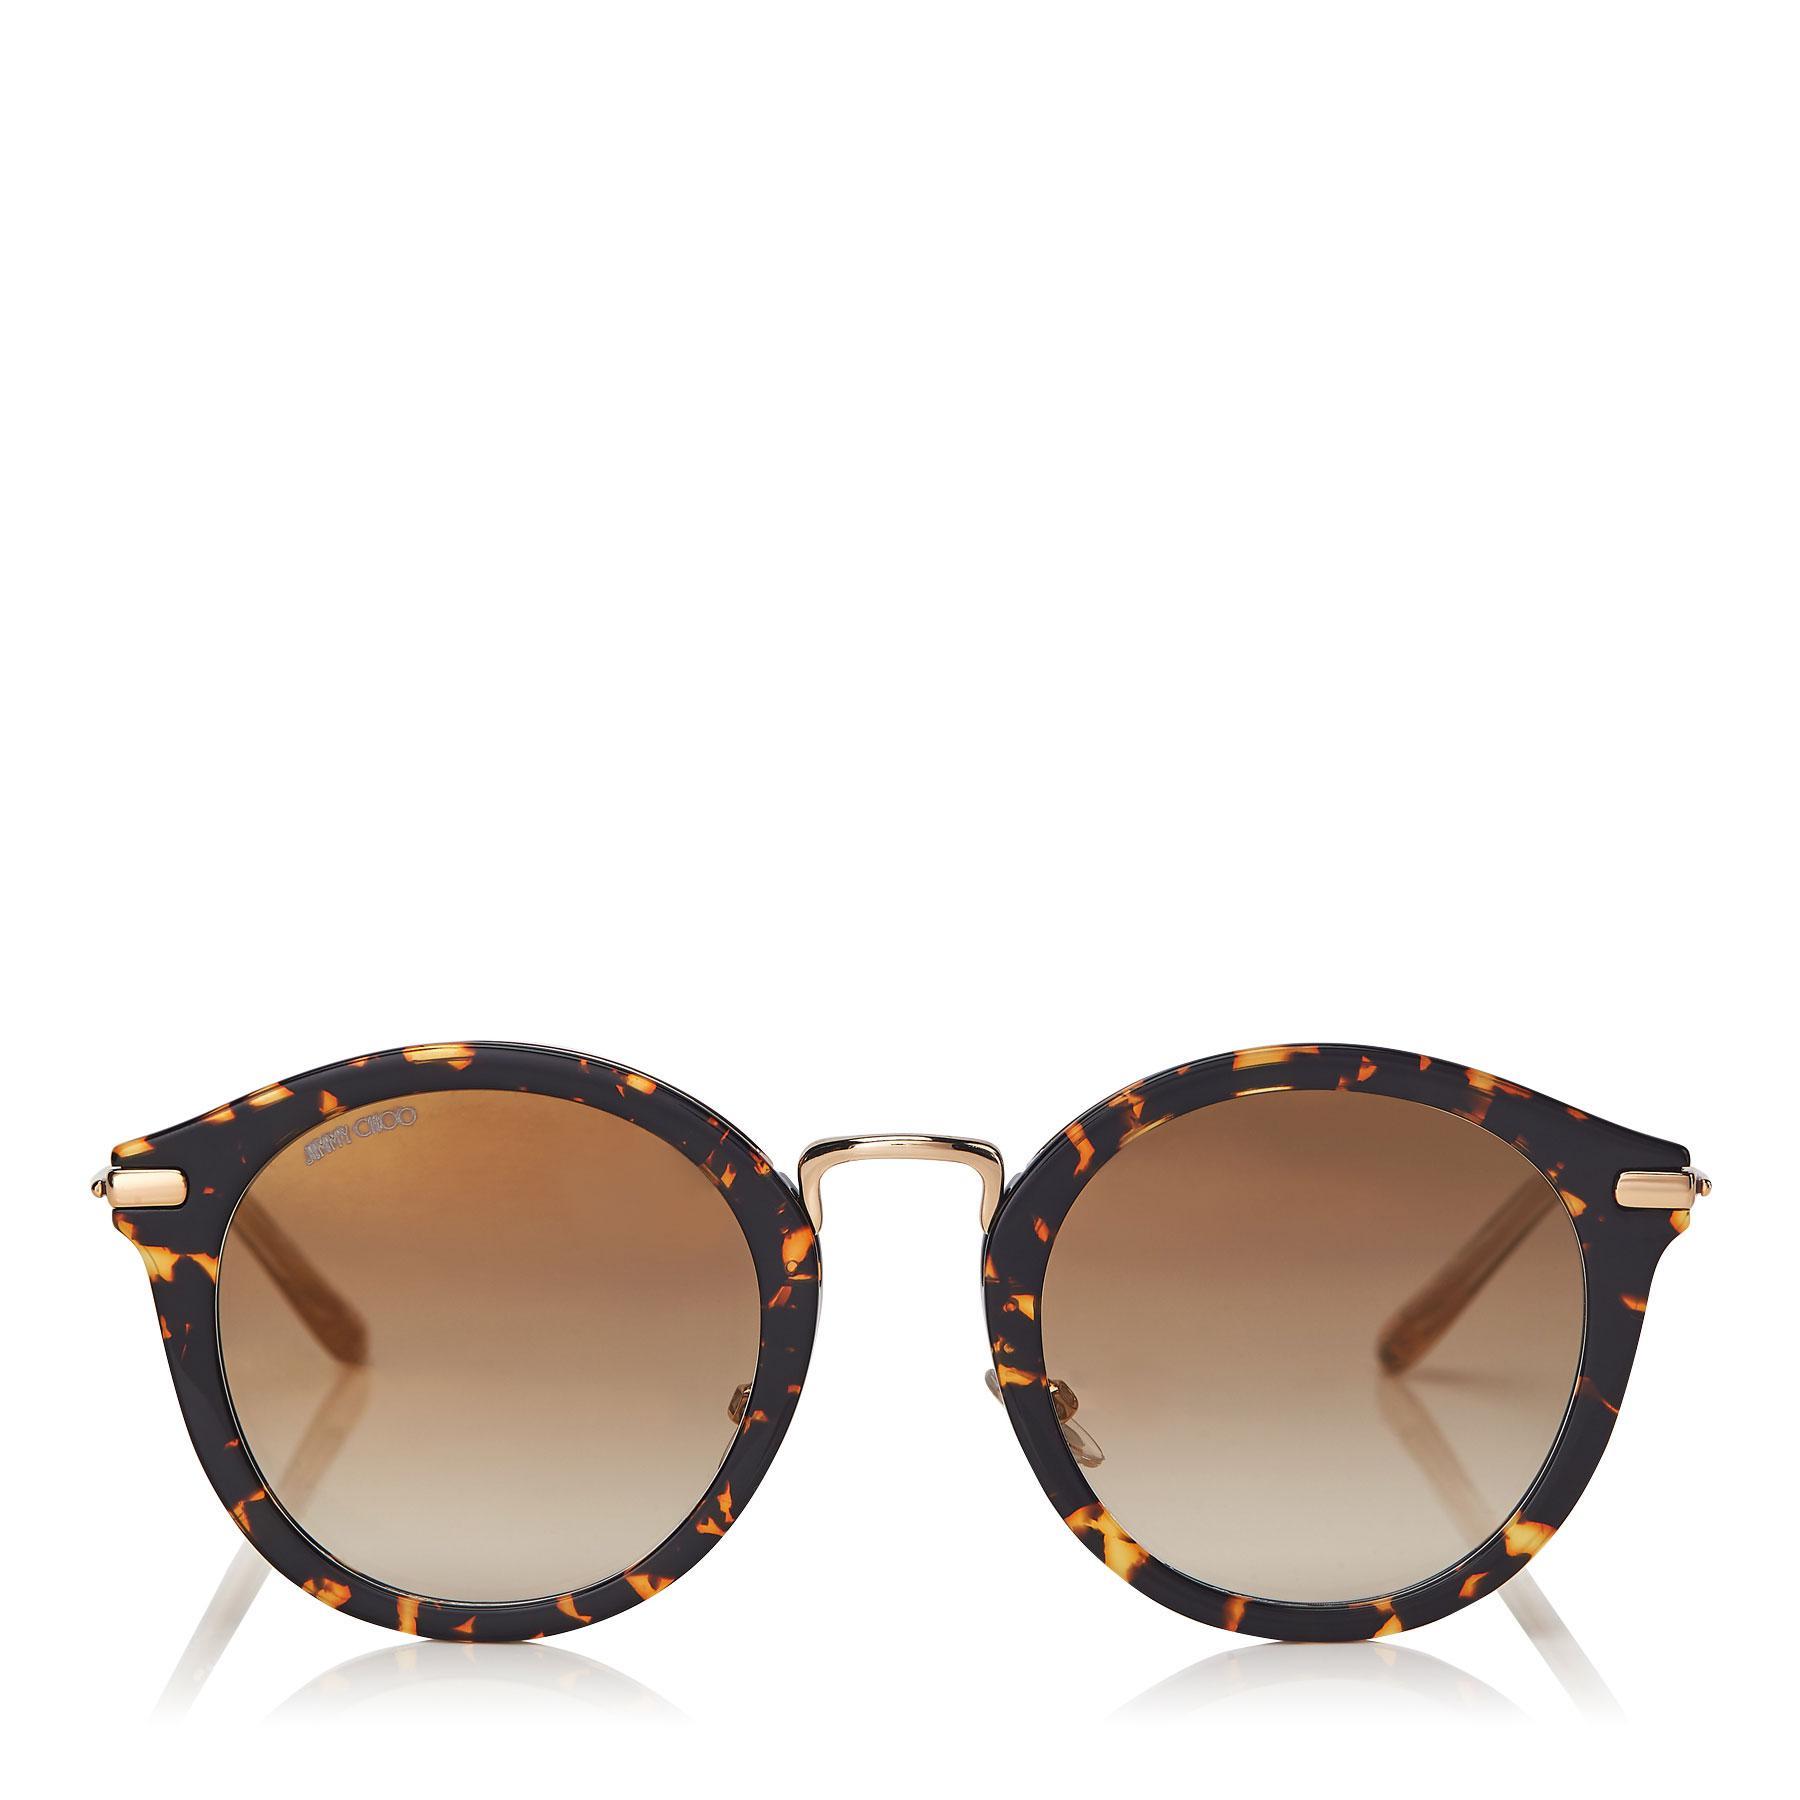 80222be0aef03 Jimmy Choo. Women s Brown Bobby Dark Havana Round Frame Sunglasses With Gold  Mirror Lenses